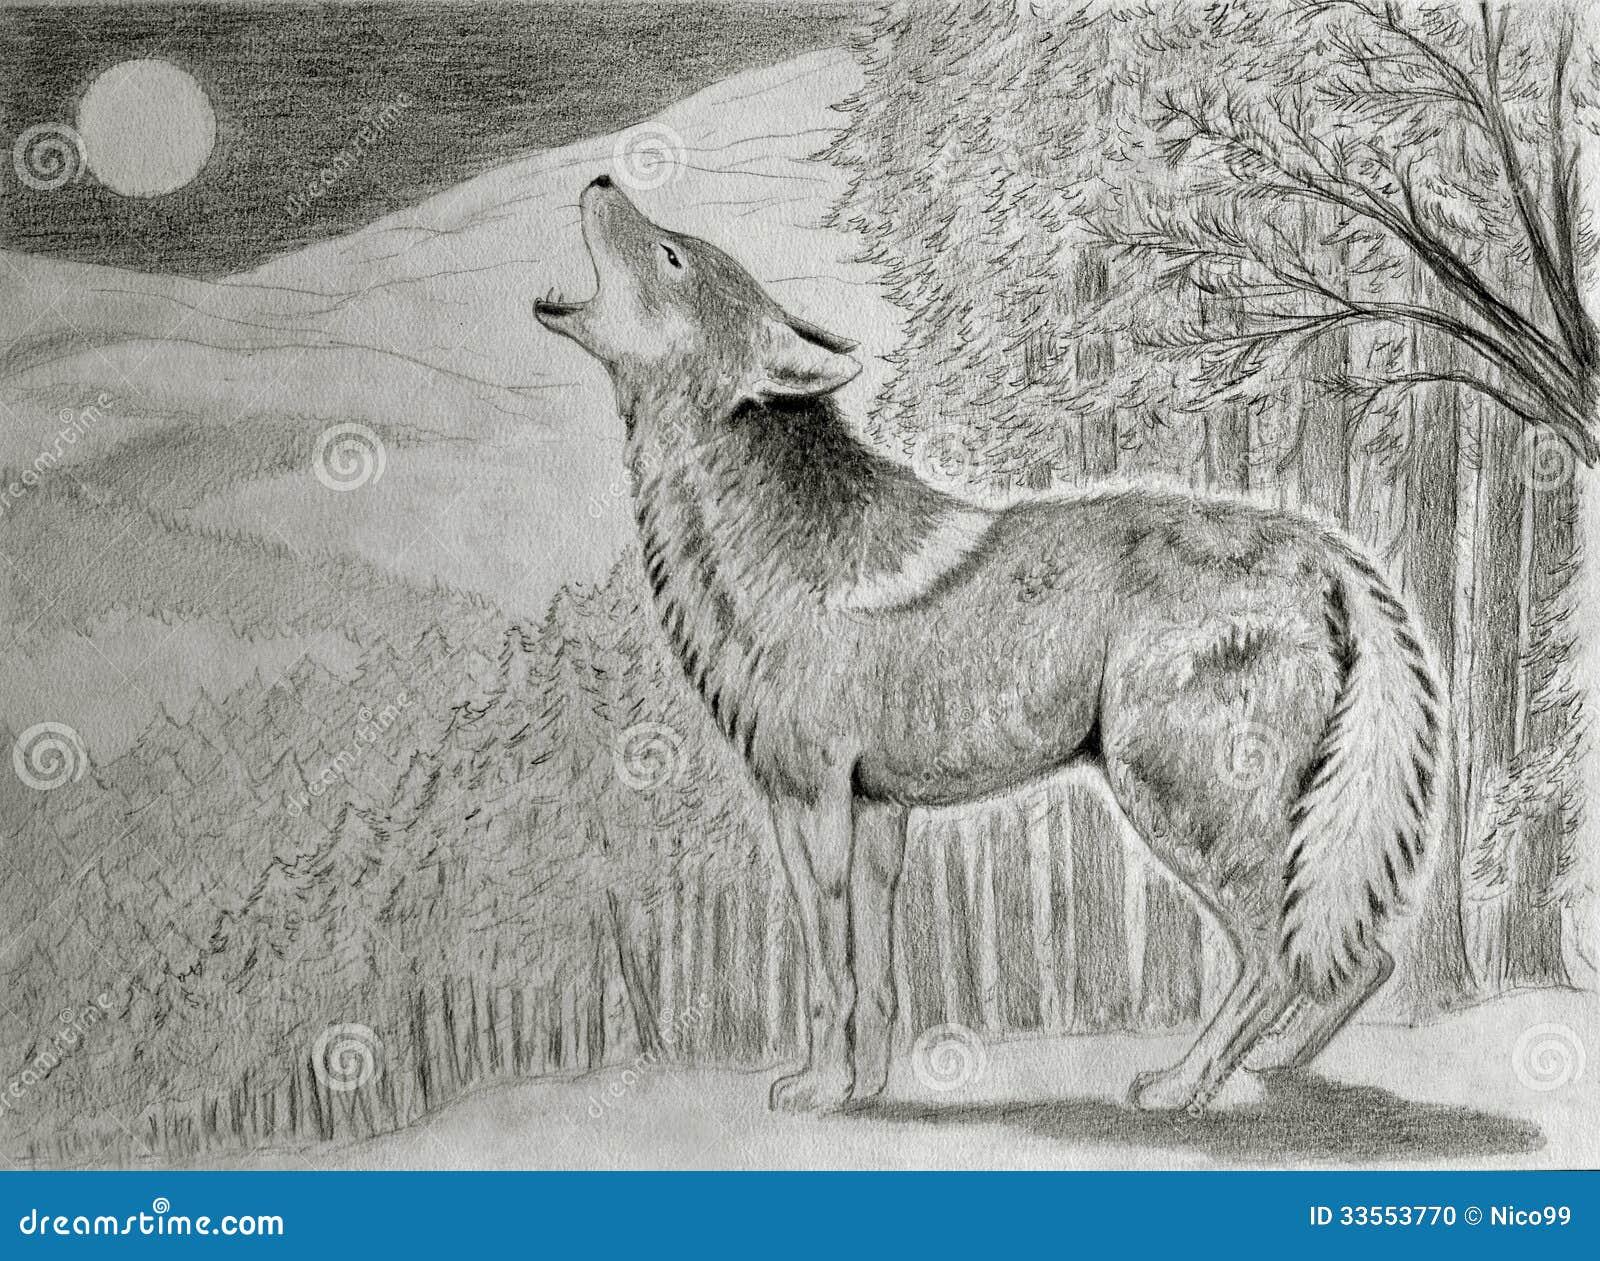 coyote howling at the moon stock illustration illustration of predator 33553770. Black Bedroom Furniture Sets. Home Design Ideas